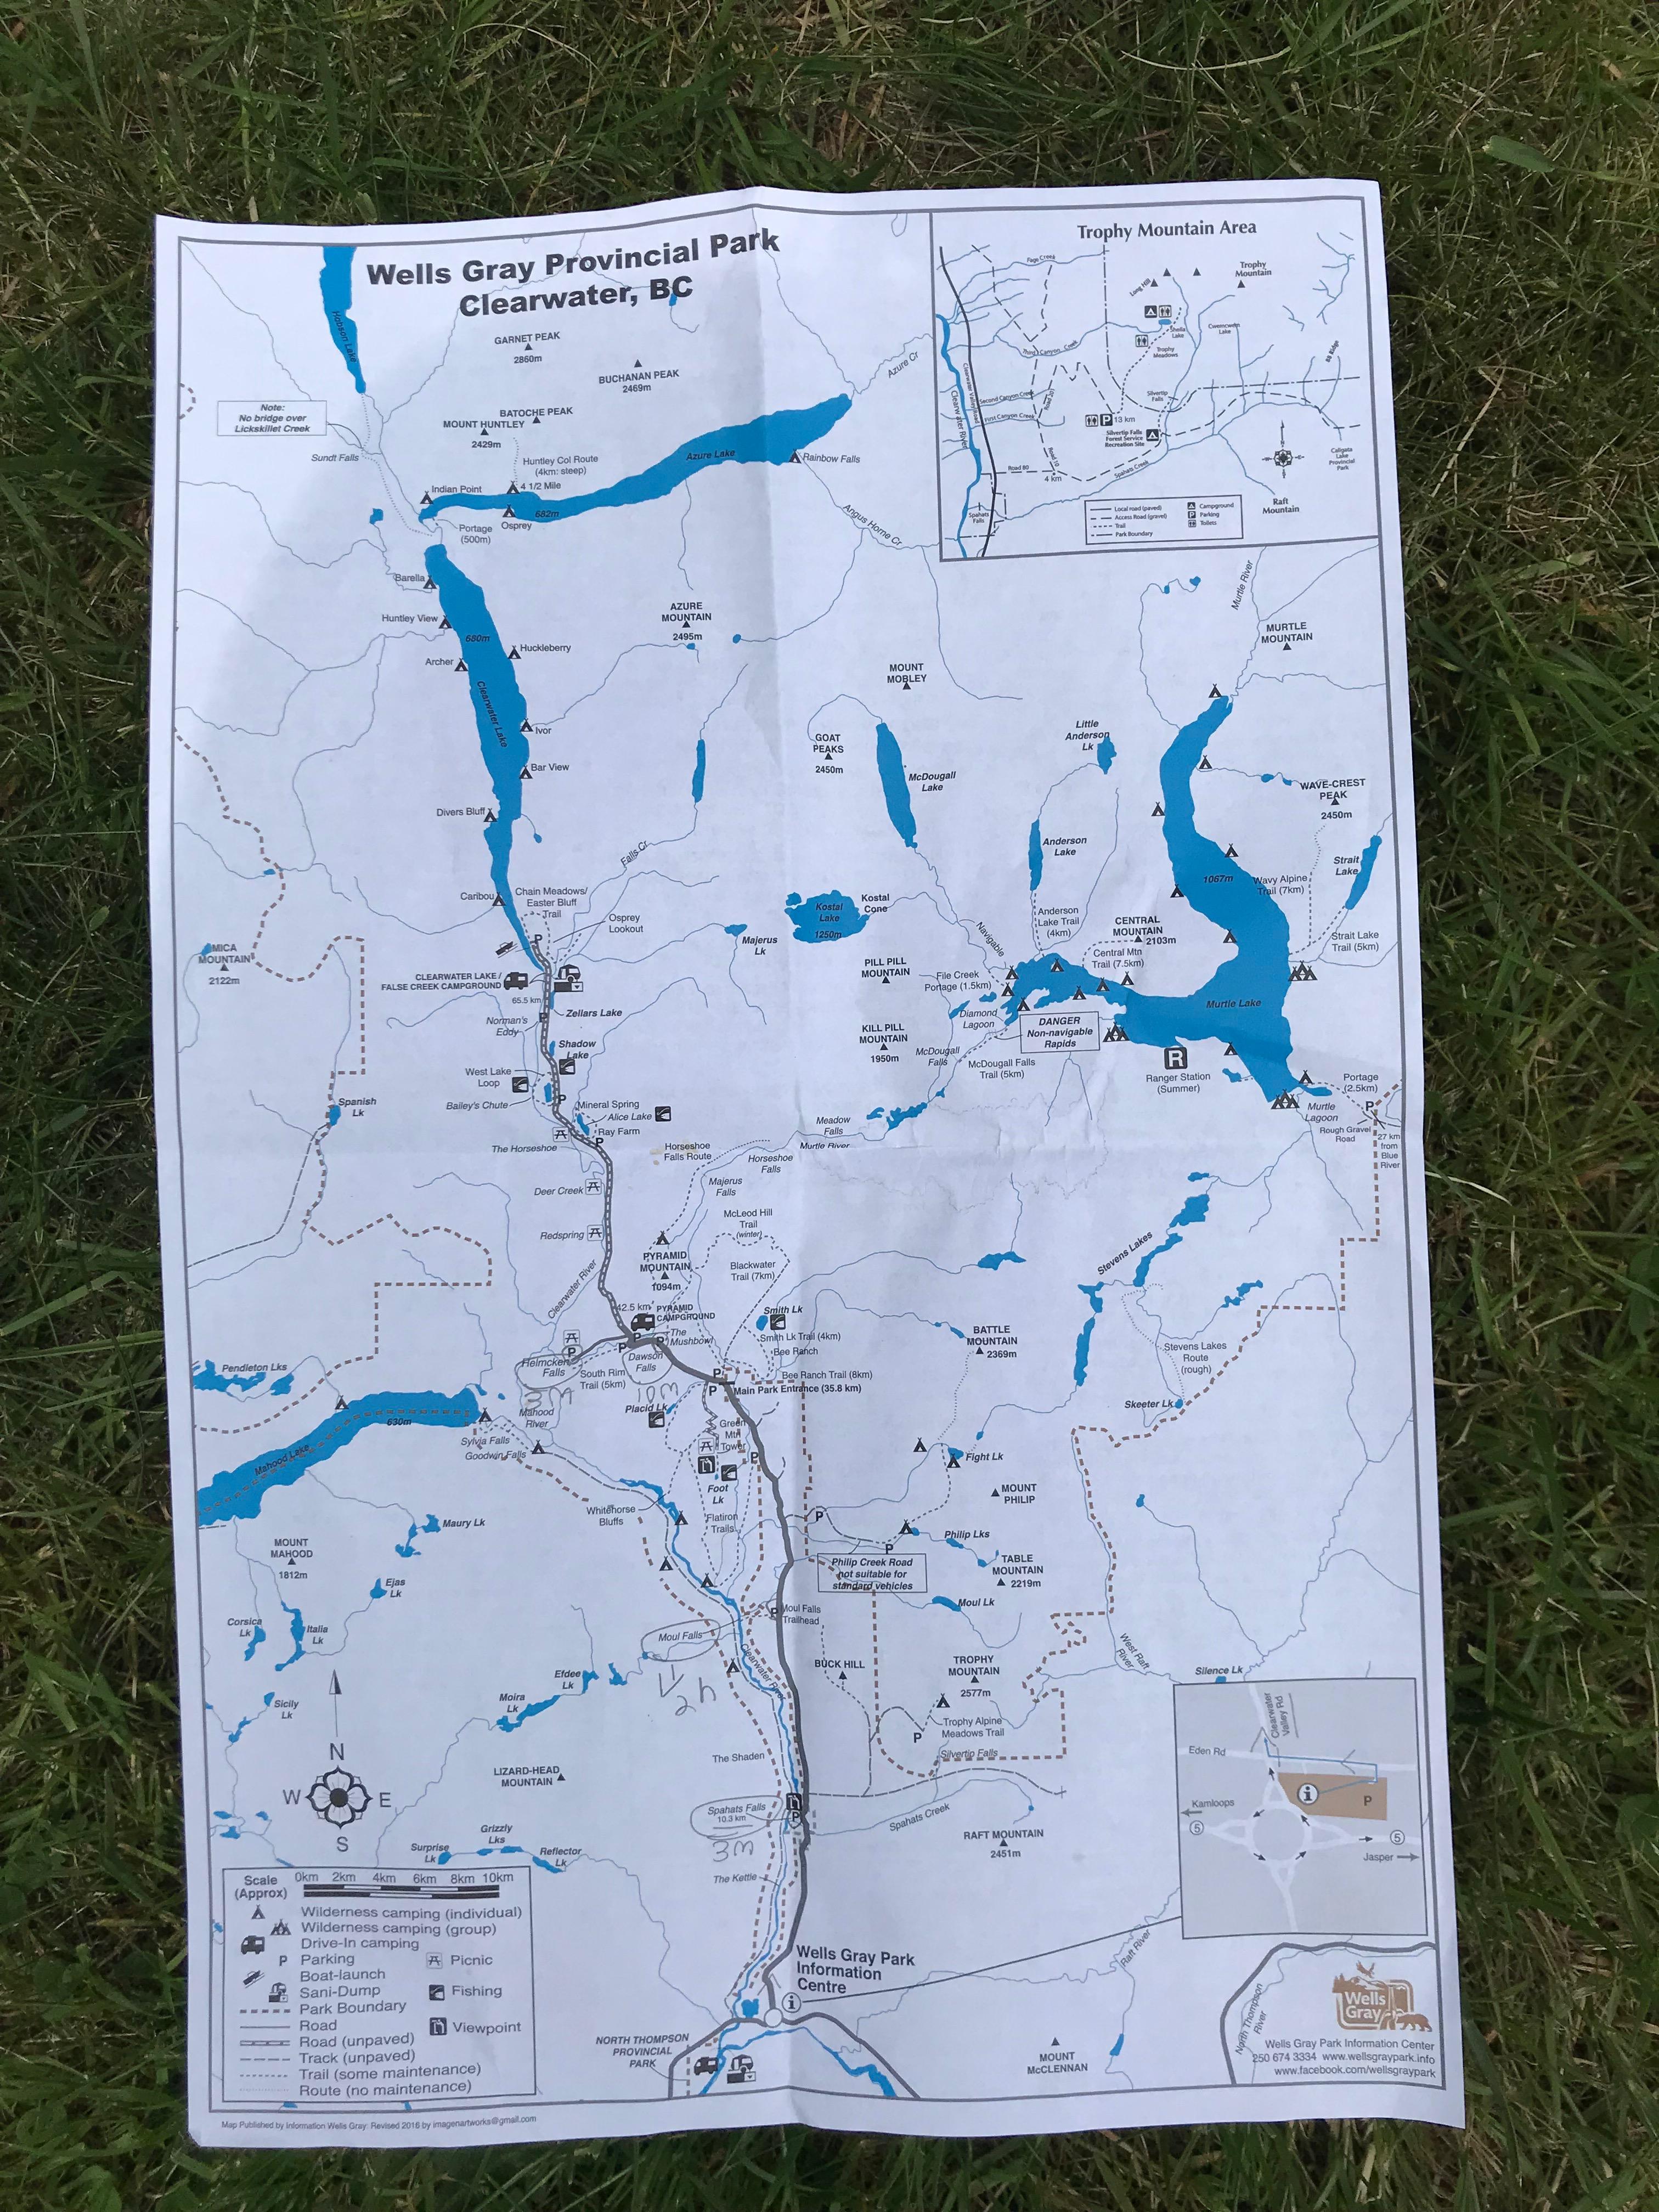 wells gray park map